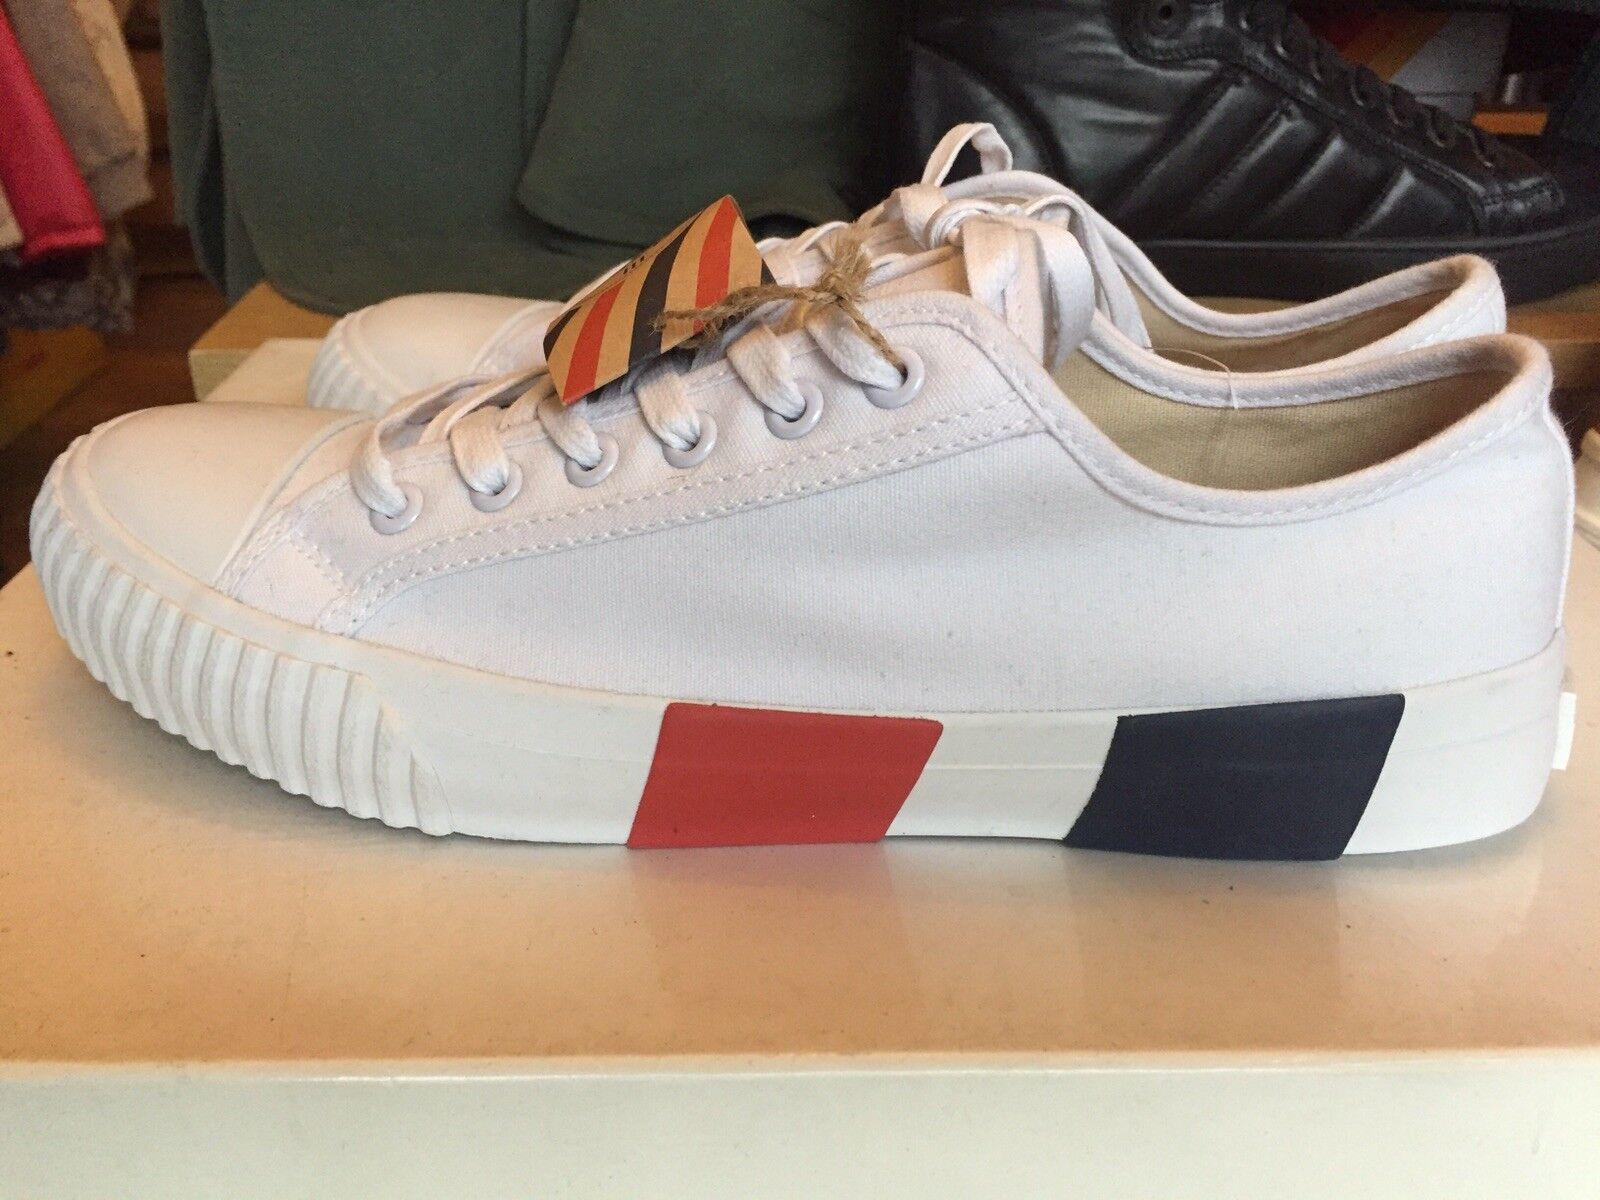 Bata Bullets Canvas shoes, White, UK 7 (Brand New)